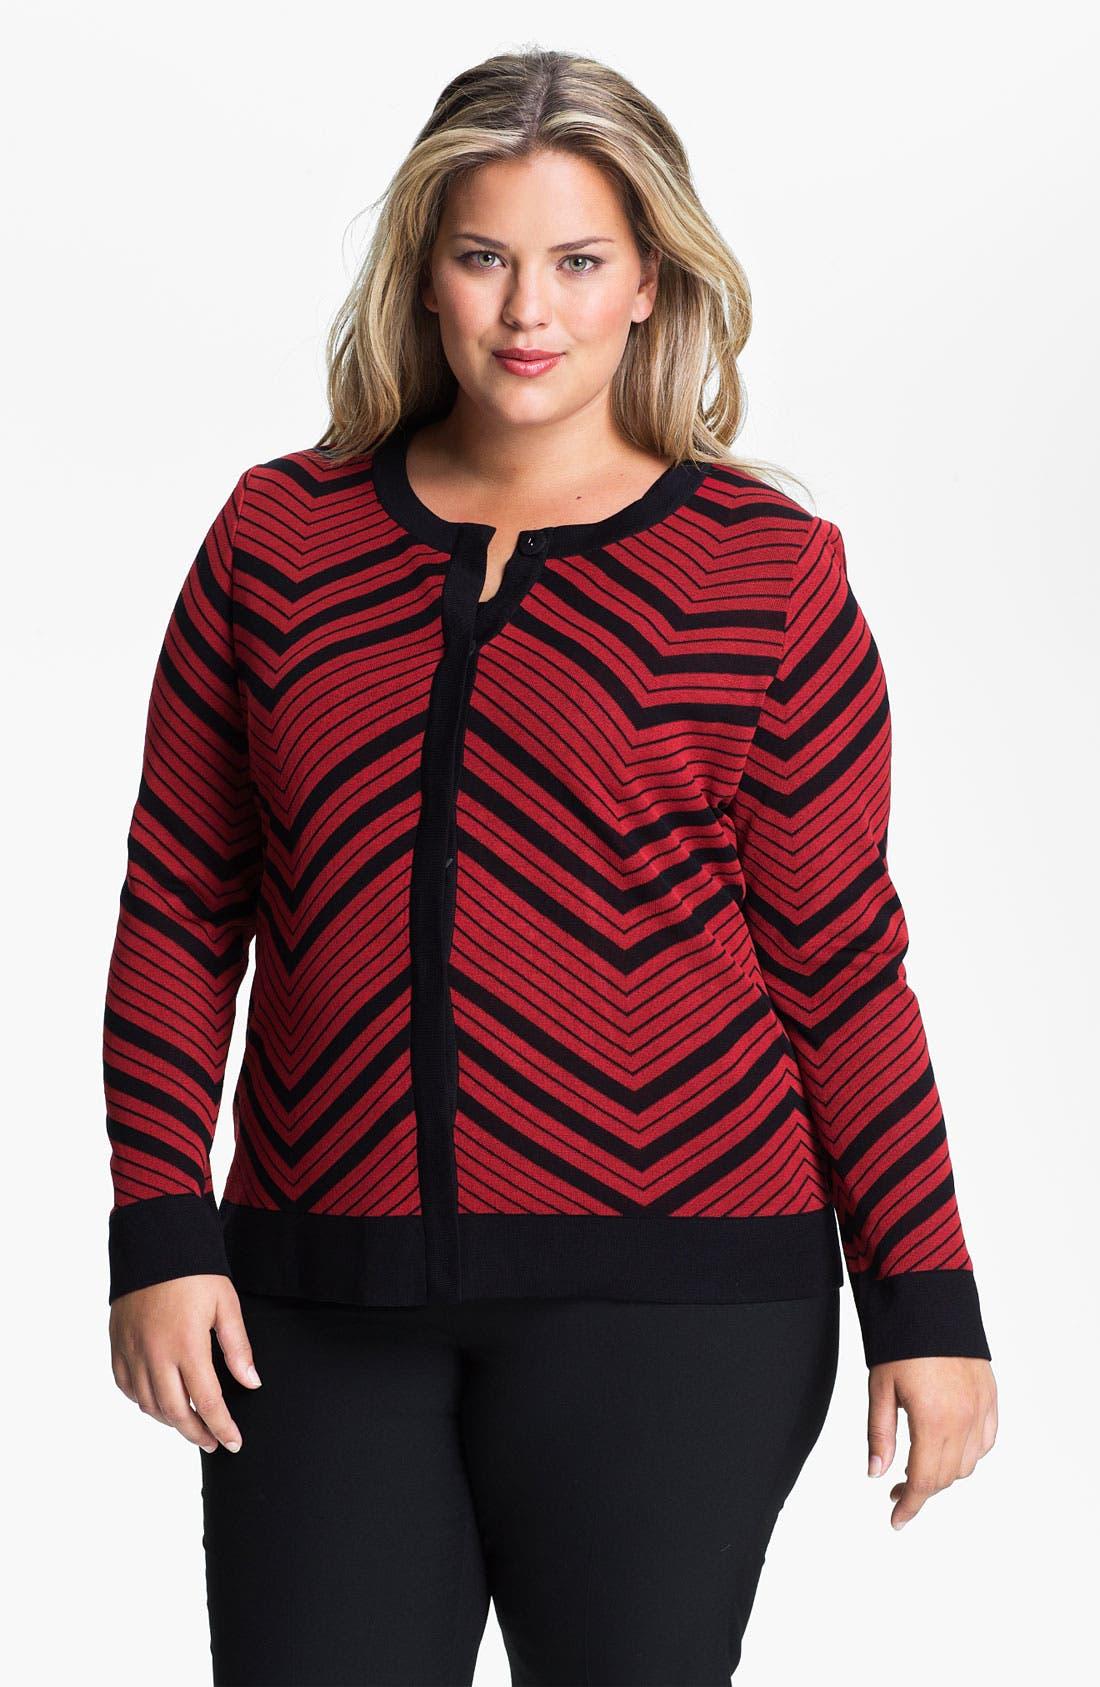 Main Image - Exclusively Misook Jewel Neck Herringbone Pattern Jacket (Plus)